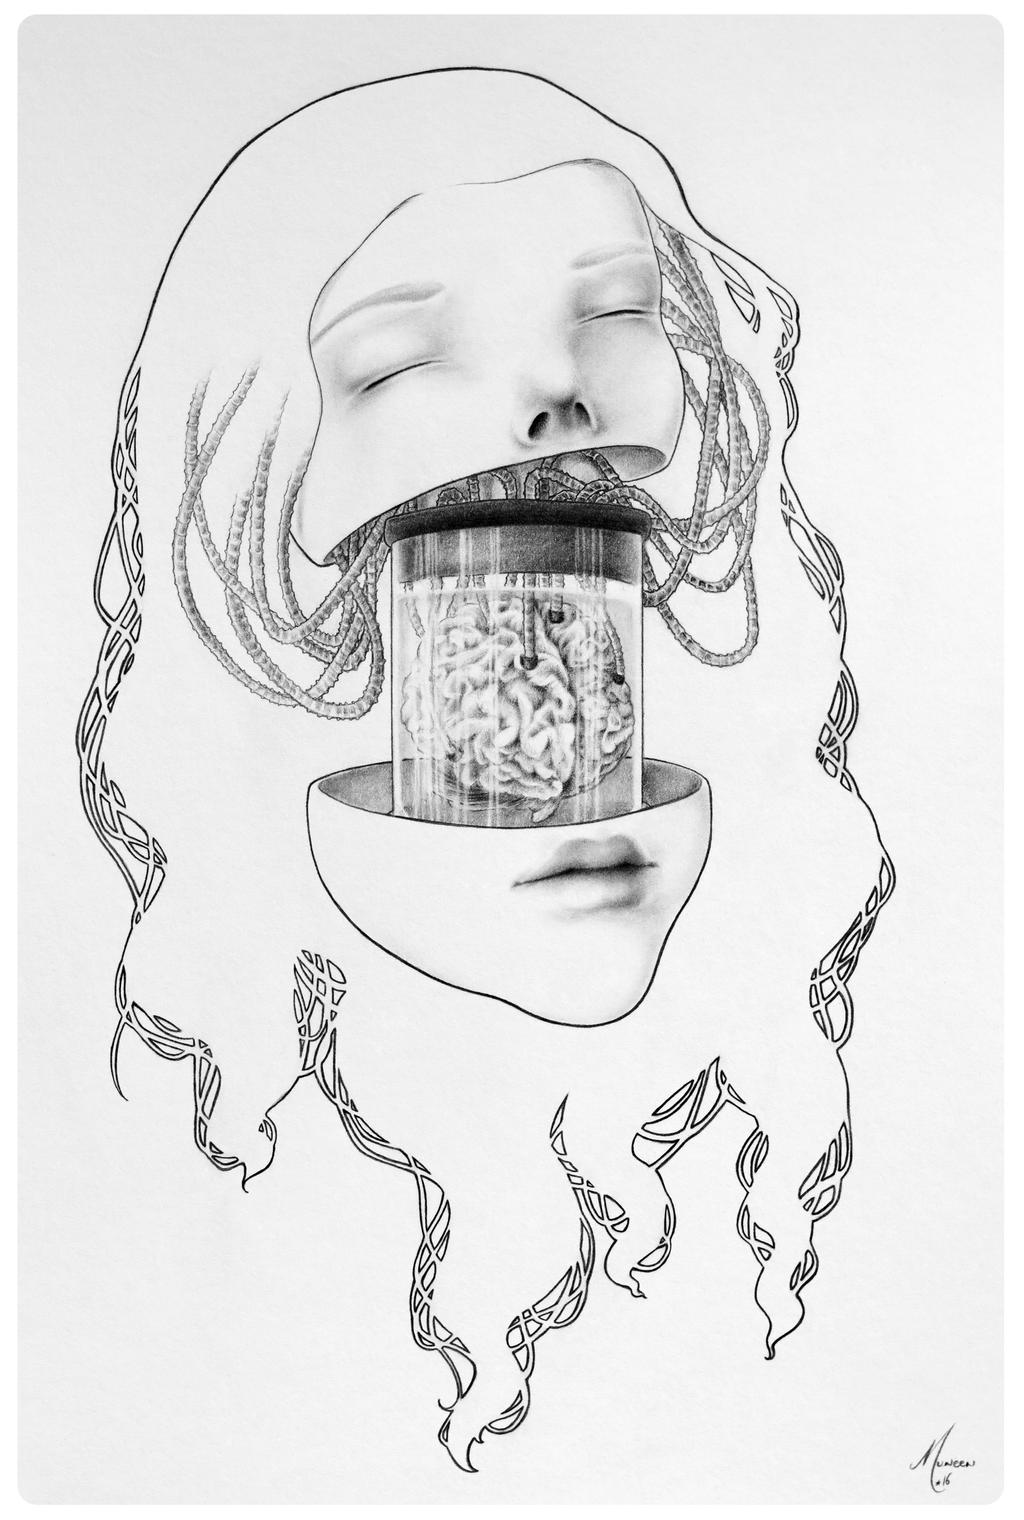 Brain in a vat by muneen